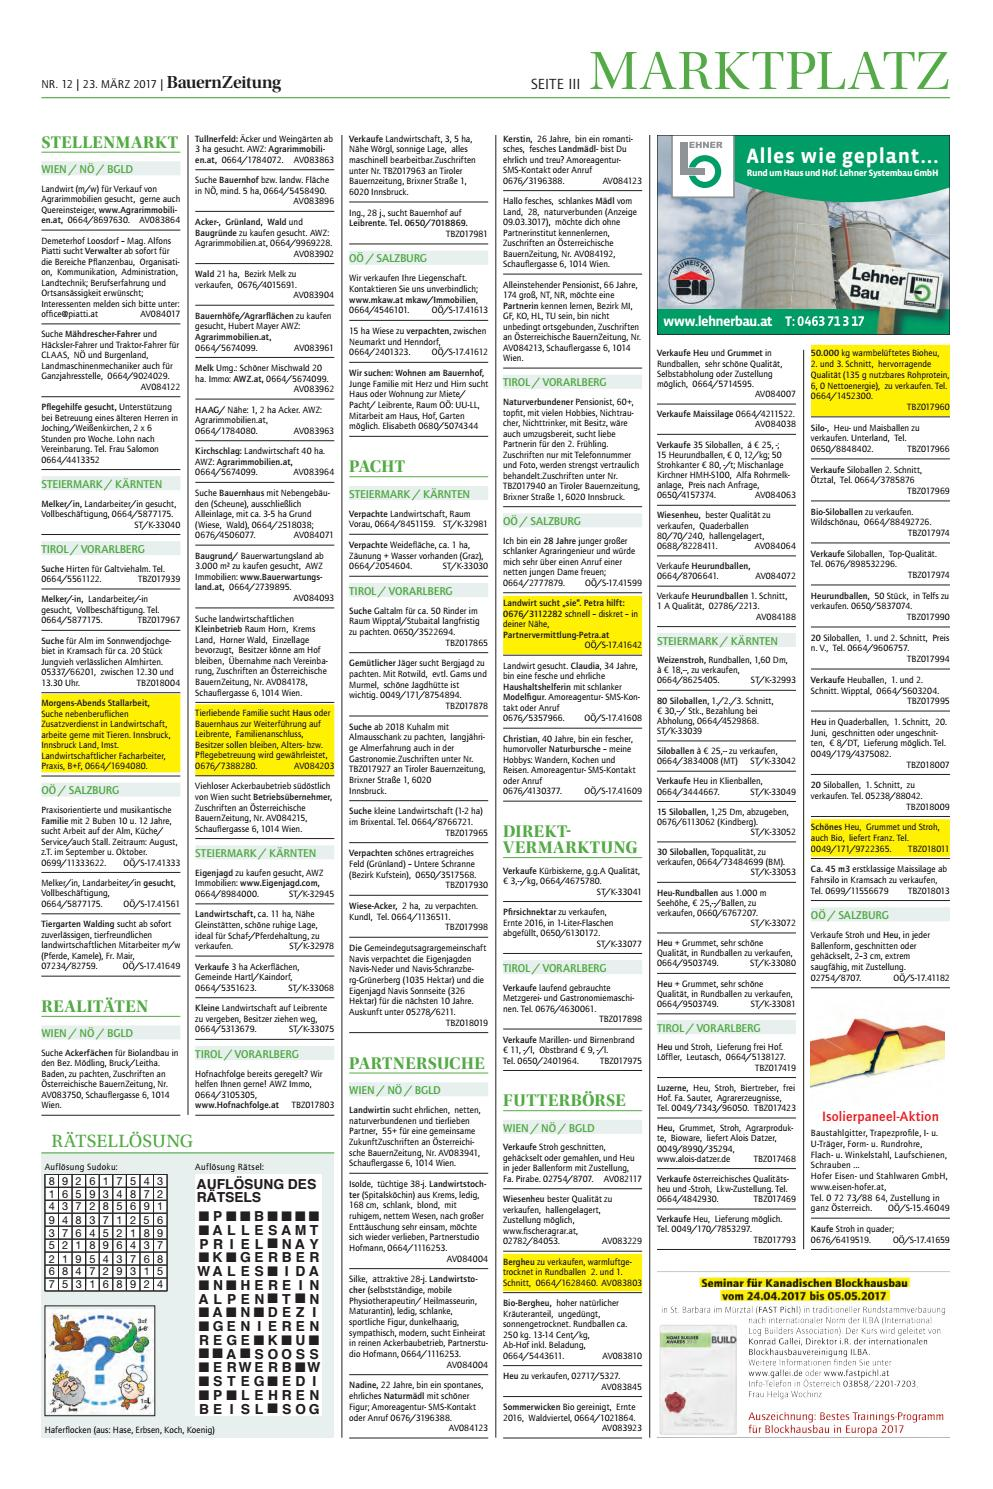 Lebensmittel / Einzelhandel in Kindberg - volunteeralert.com